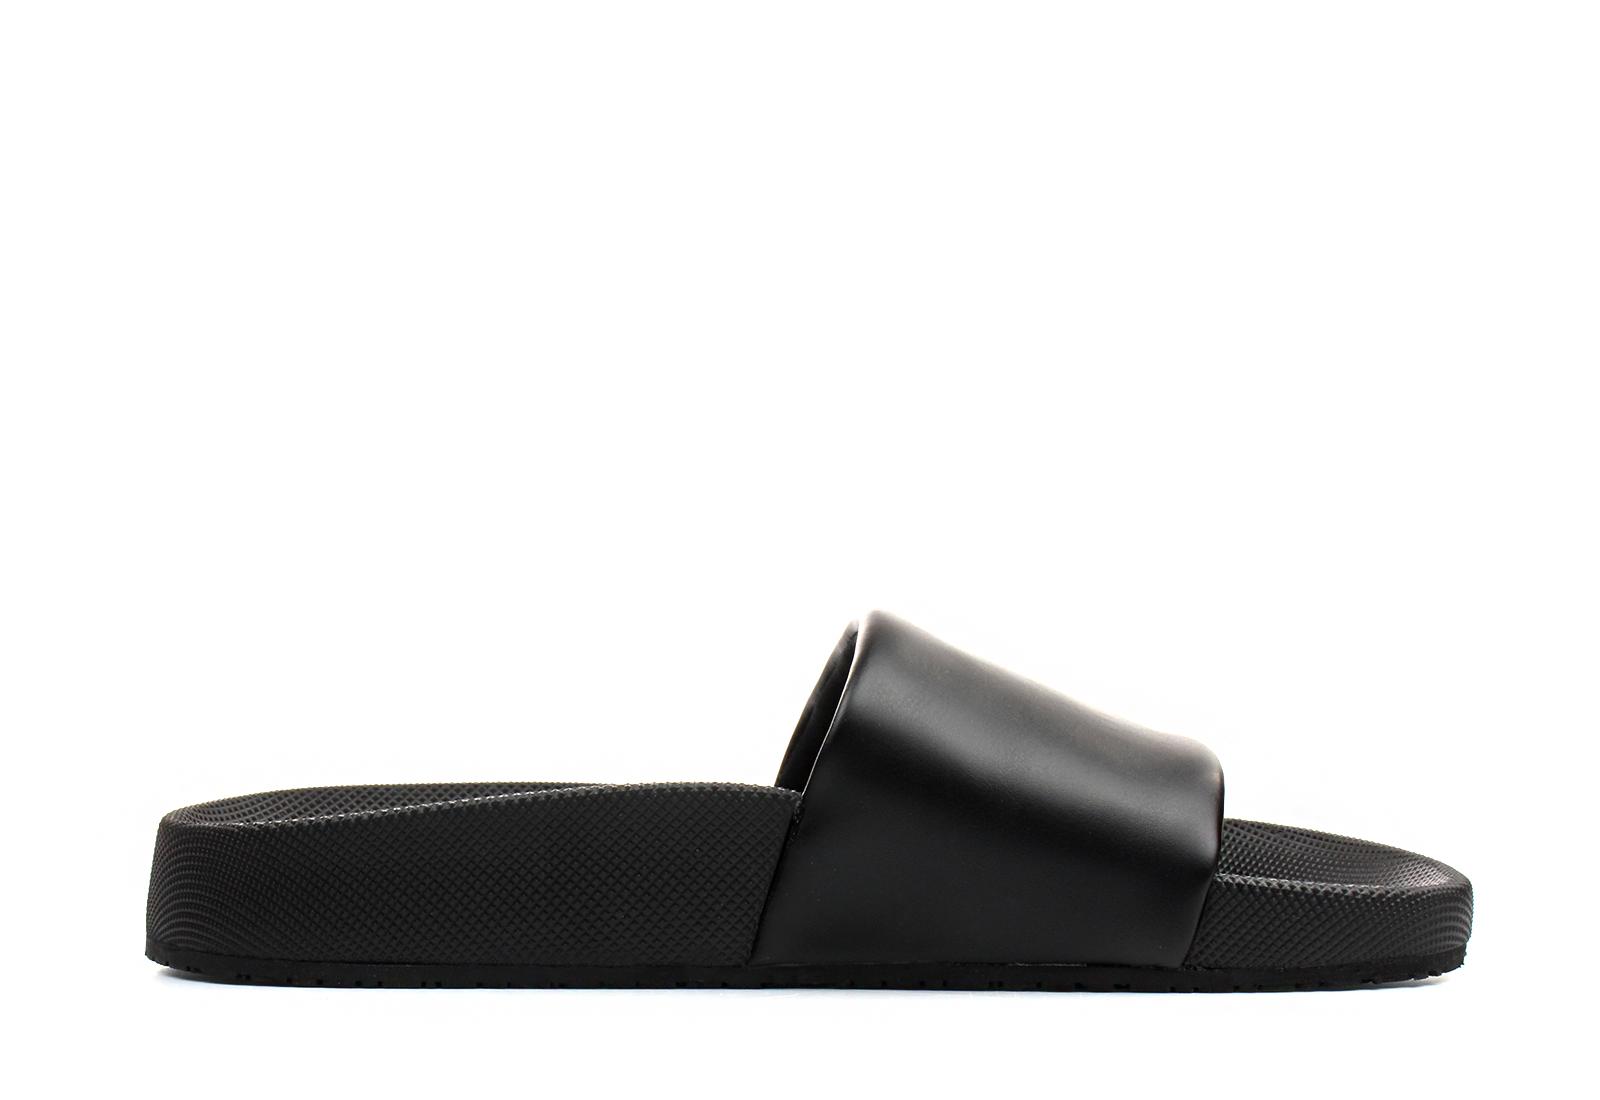 Polo Ralph Lauren Papucs - Cayson - 816691290002 - Office Shoes ... a68ad3b49c